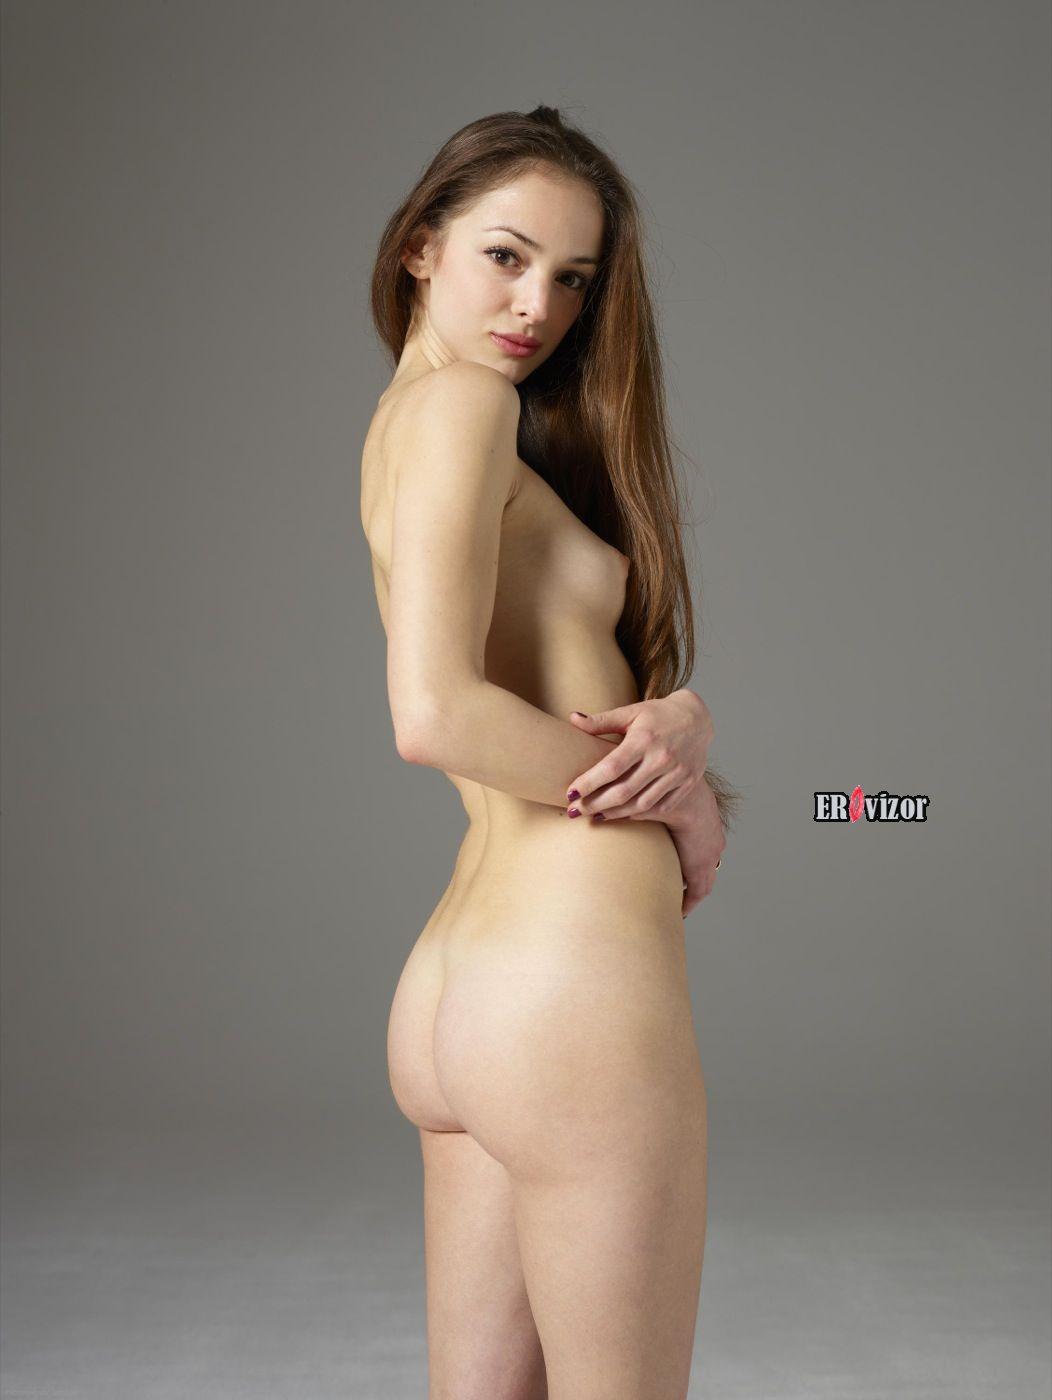 mirabell_erovizor_photo (10)